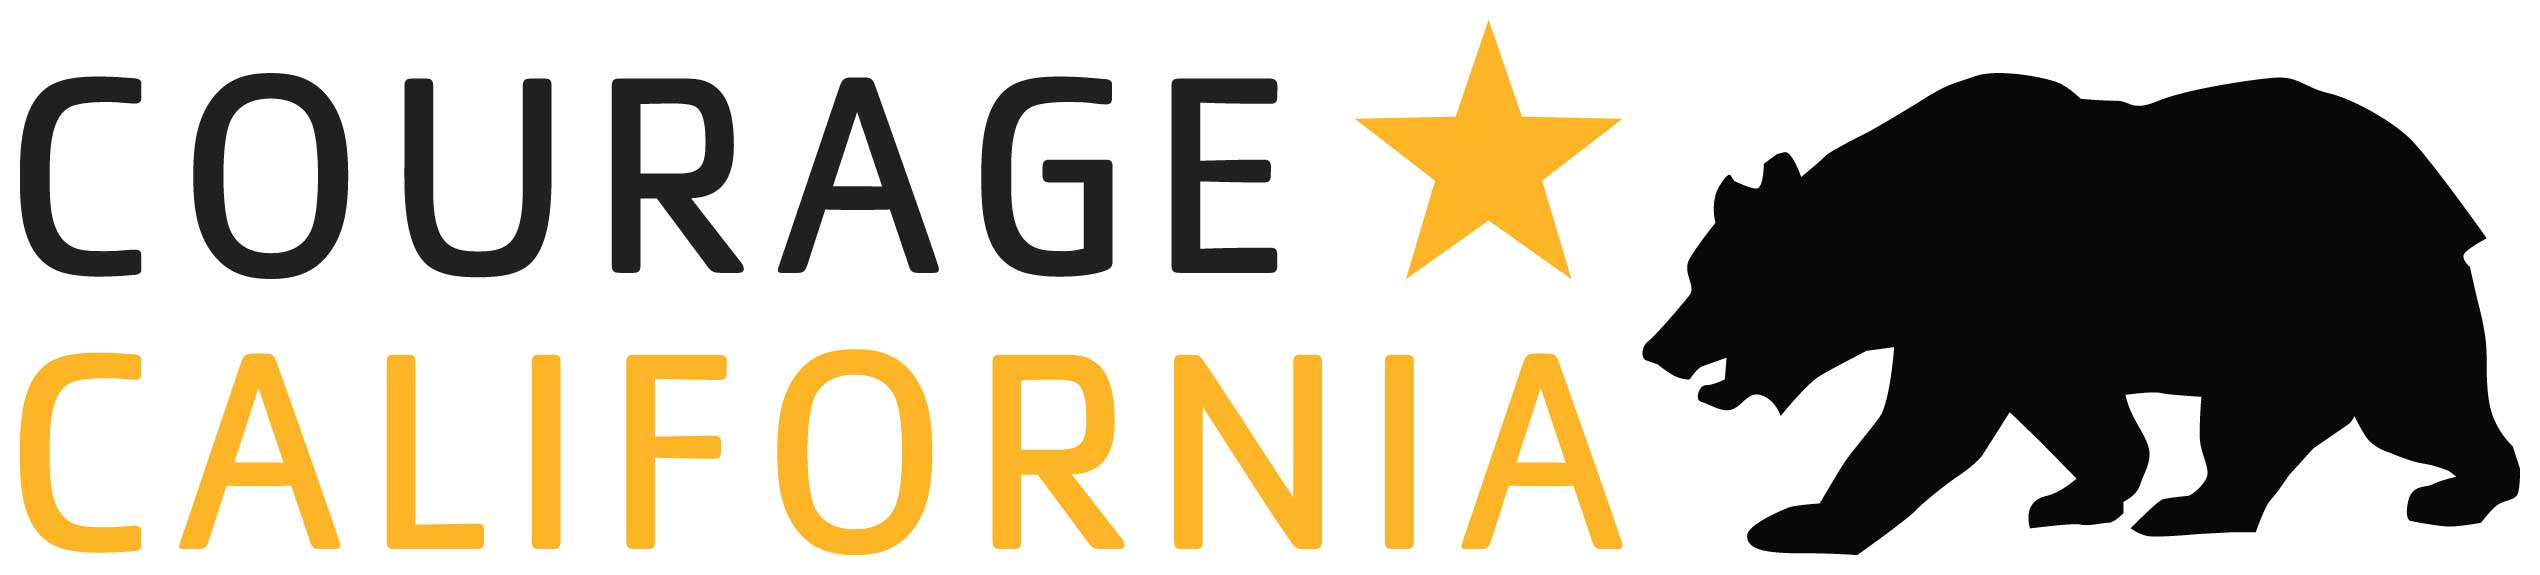 Courage California